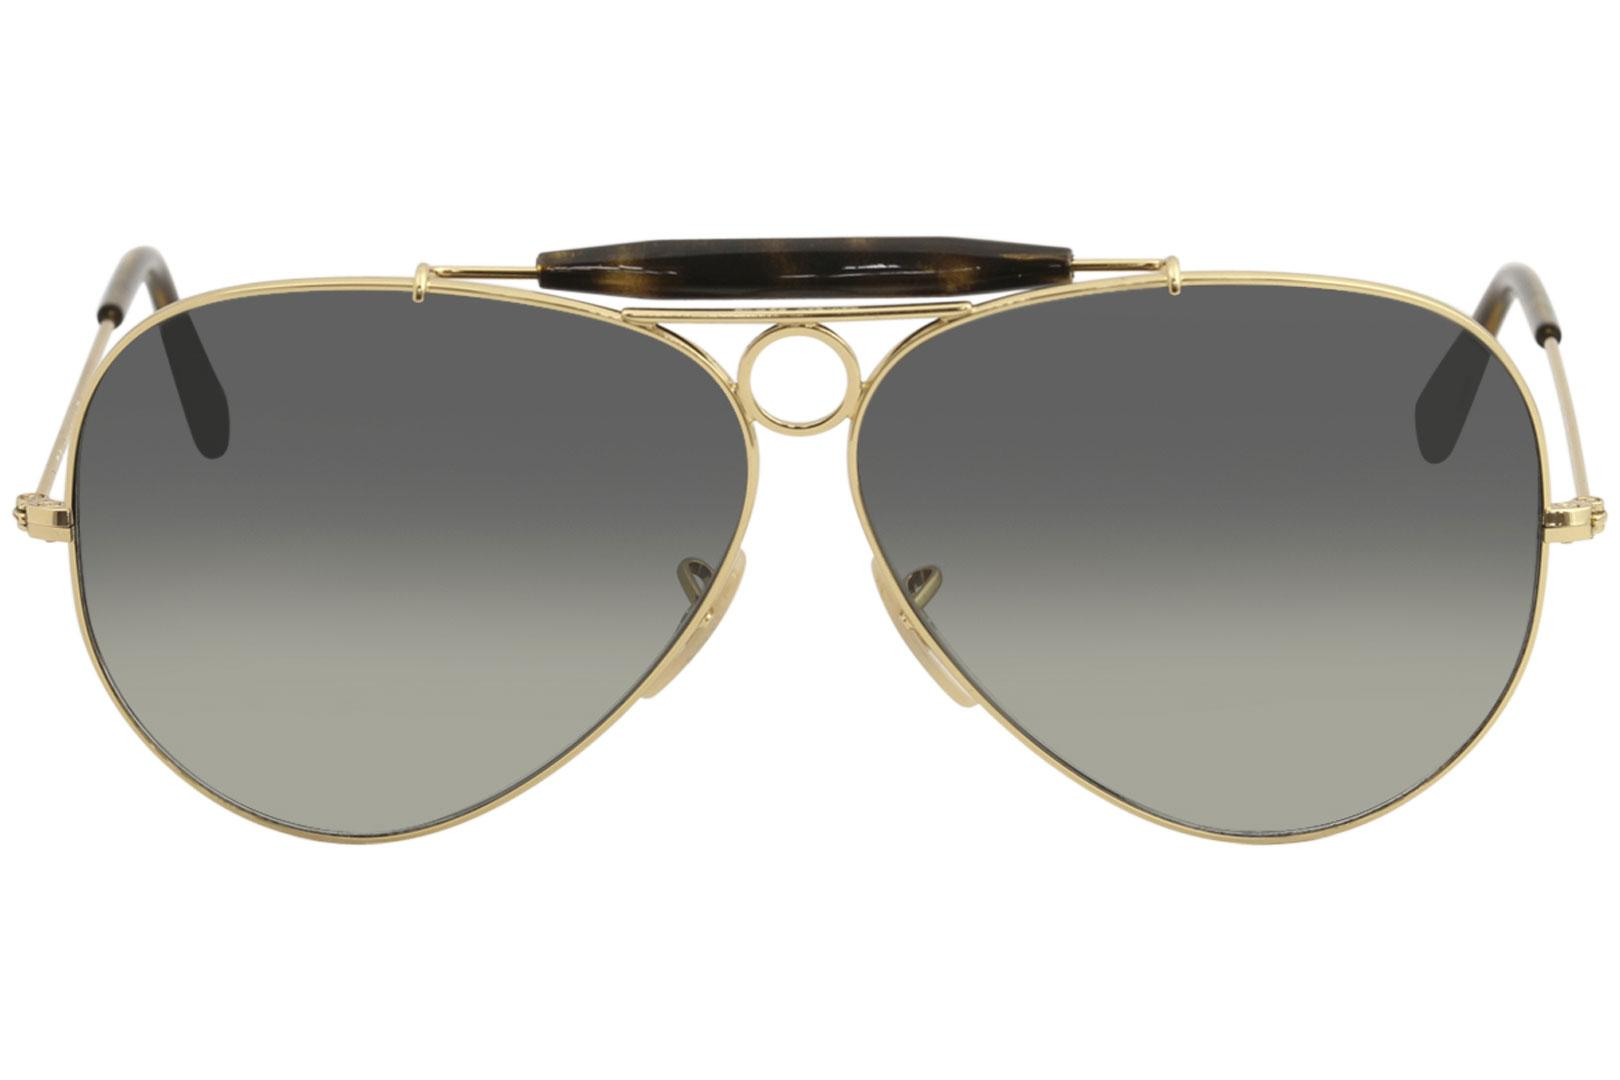 f3cd92d7e6 ... shopping ray ban mens shooter rb3138 rb 3138 rayban fashion aviator  sunglasses b22b6 ae949